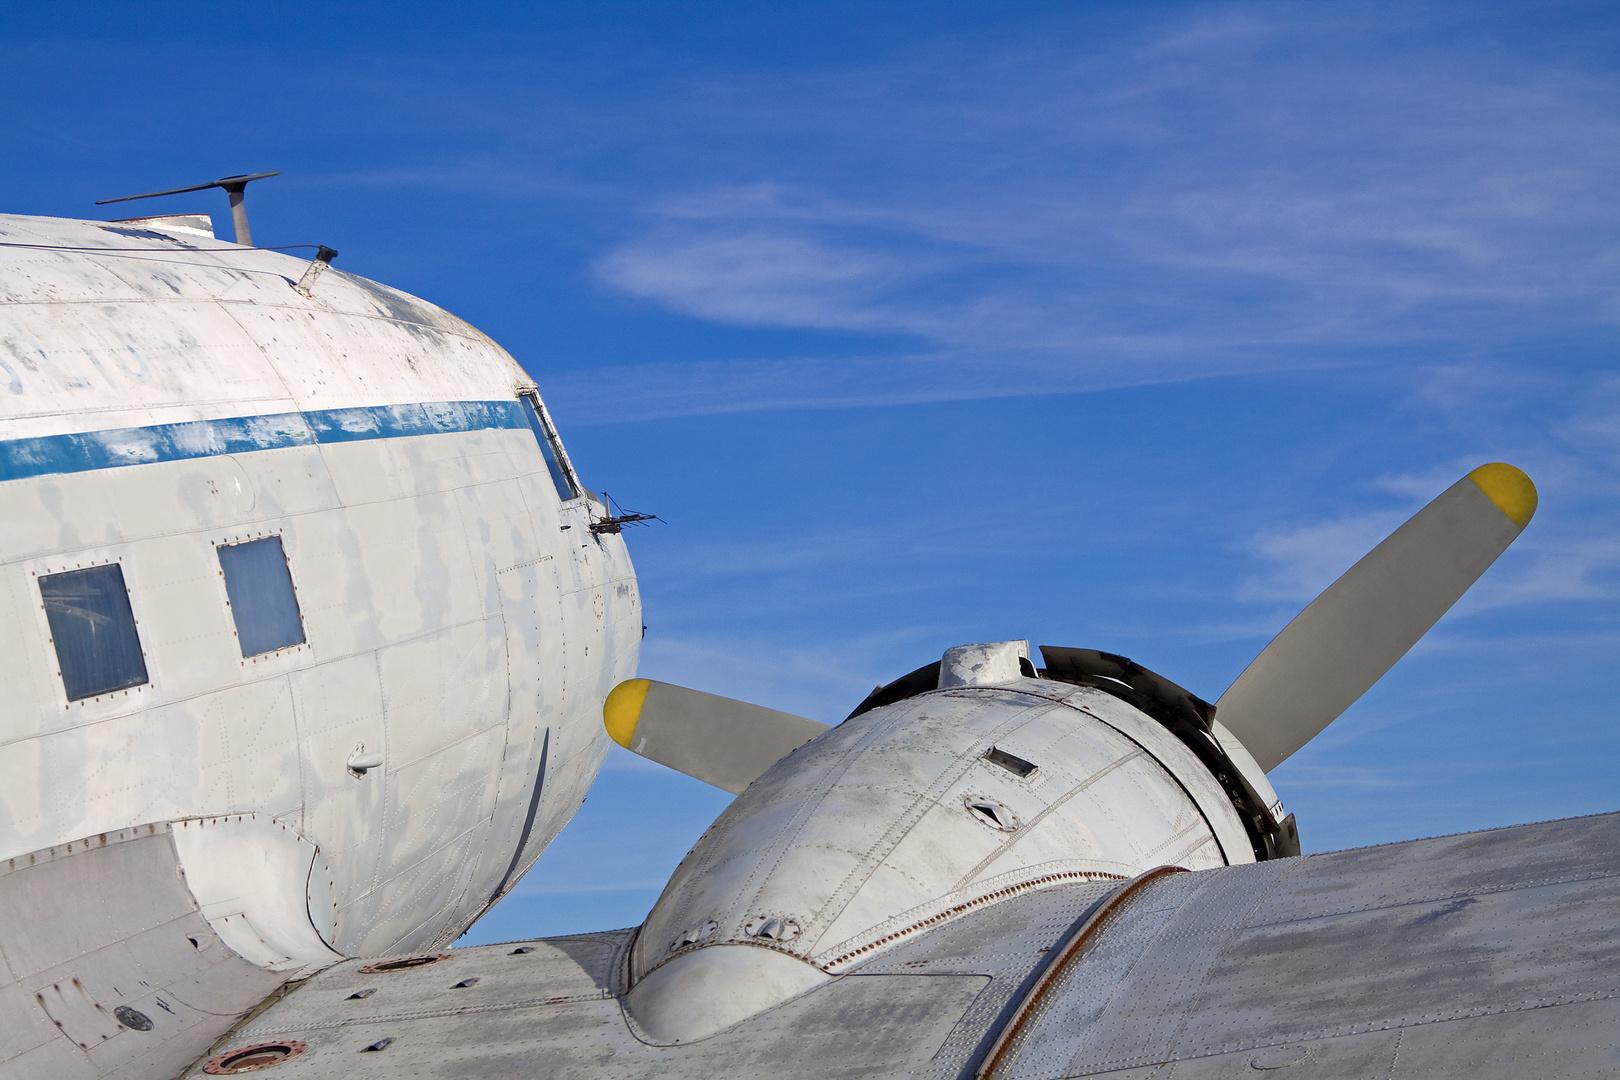 Douglas DC-3 C-47 Skytrain